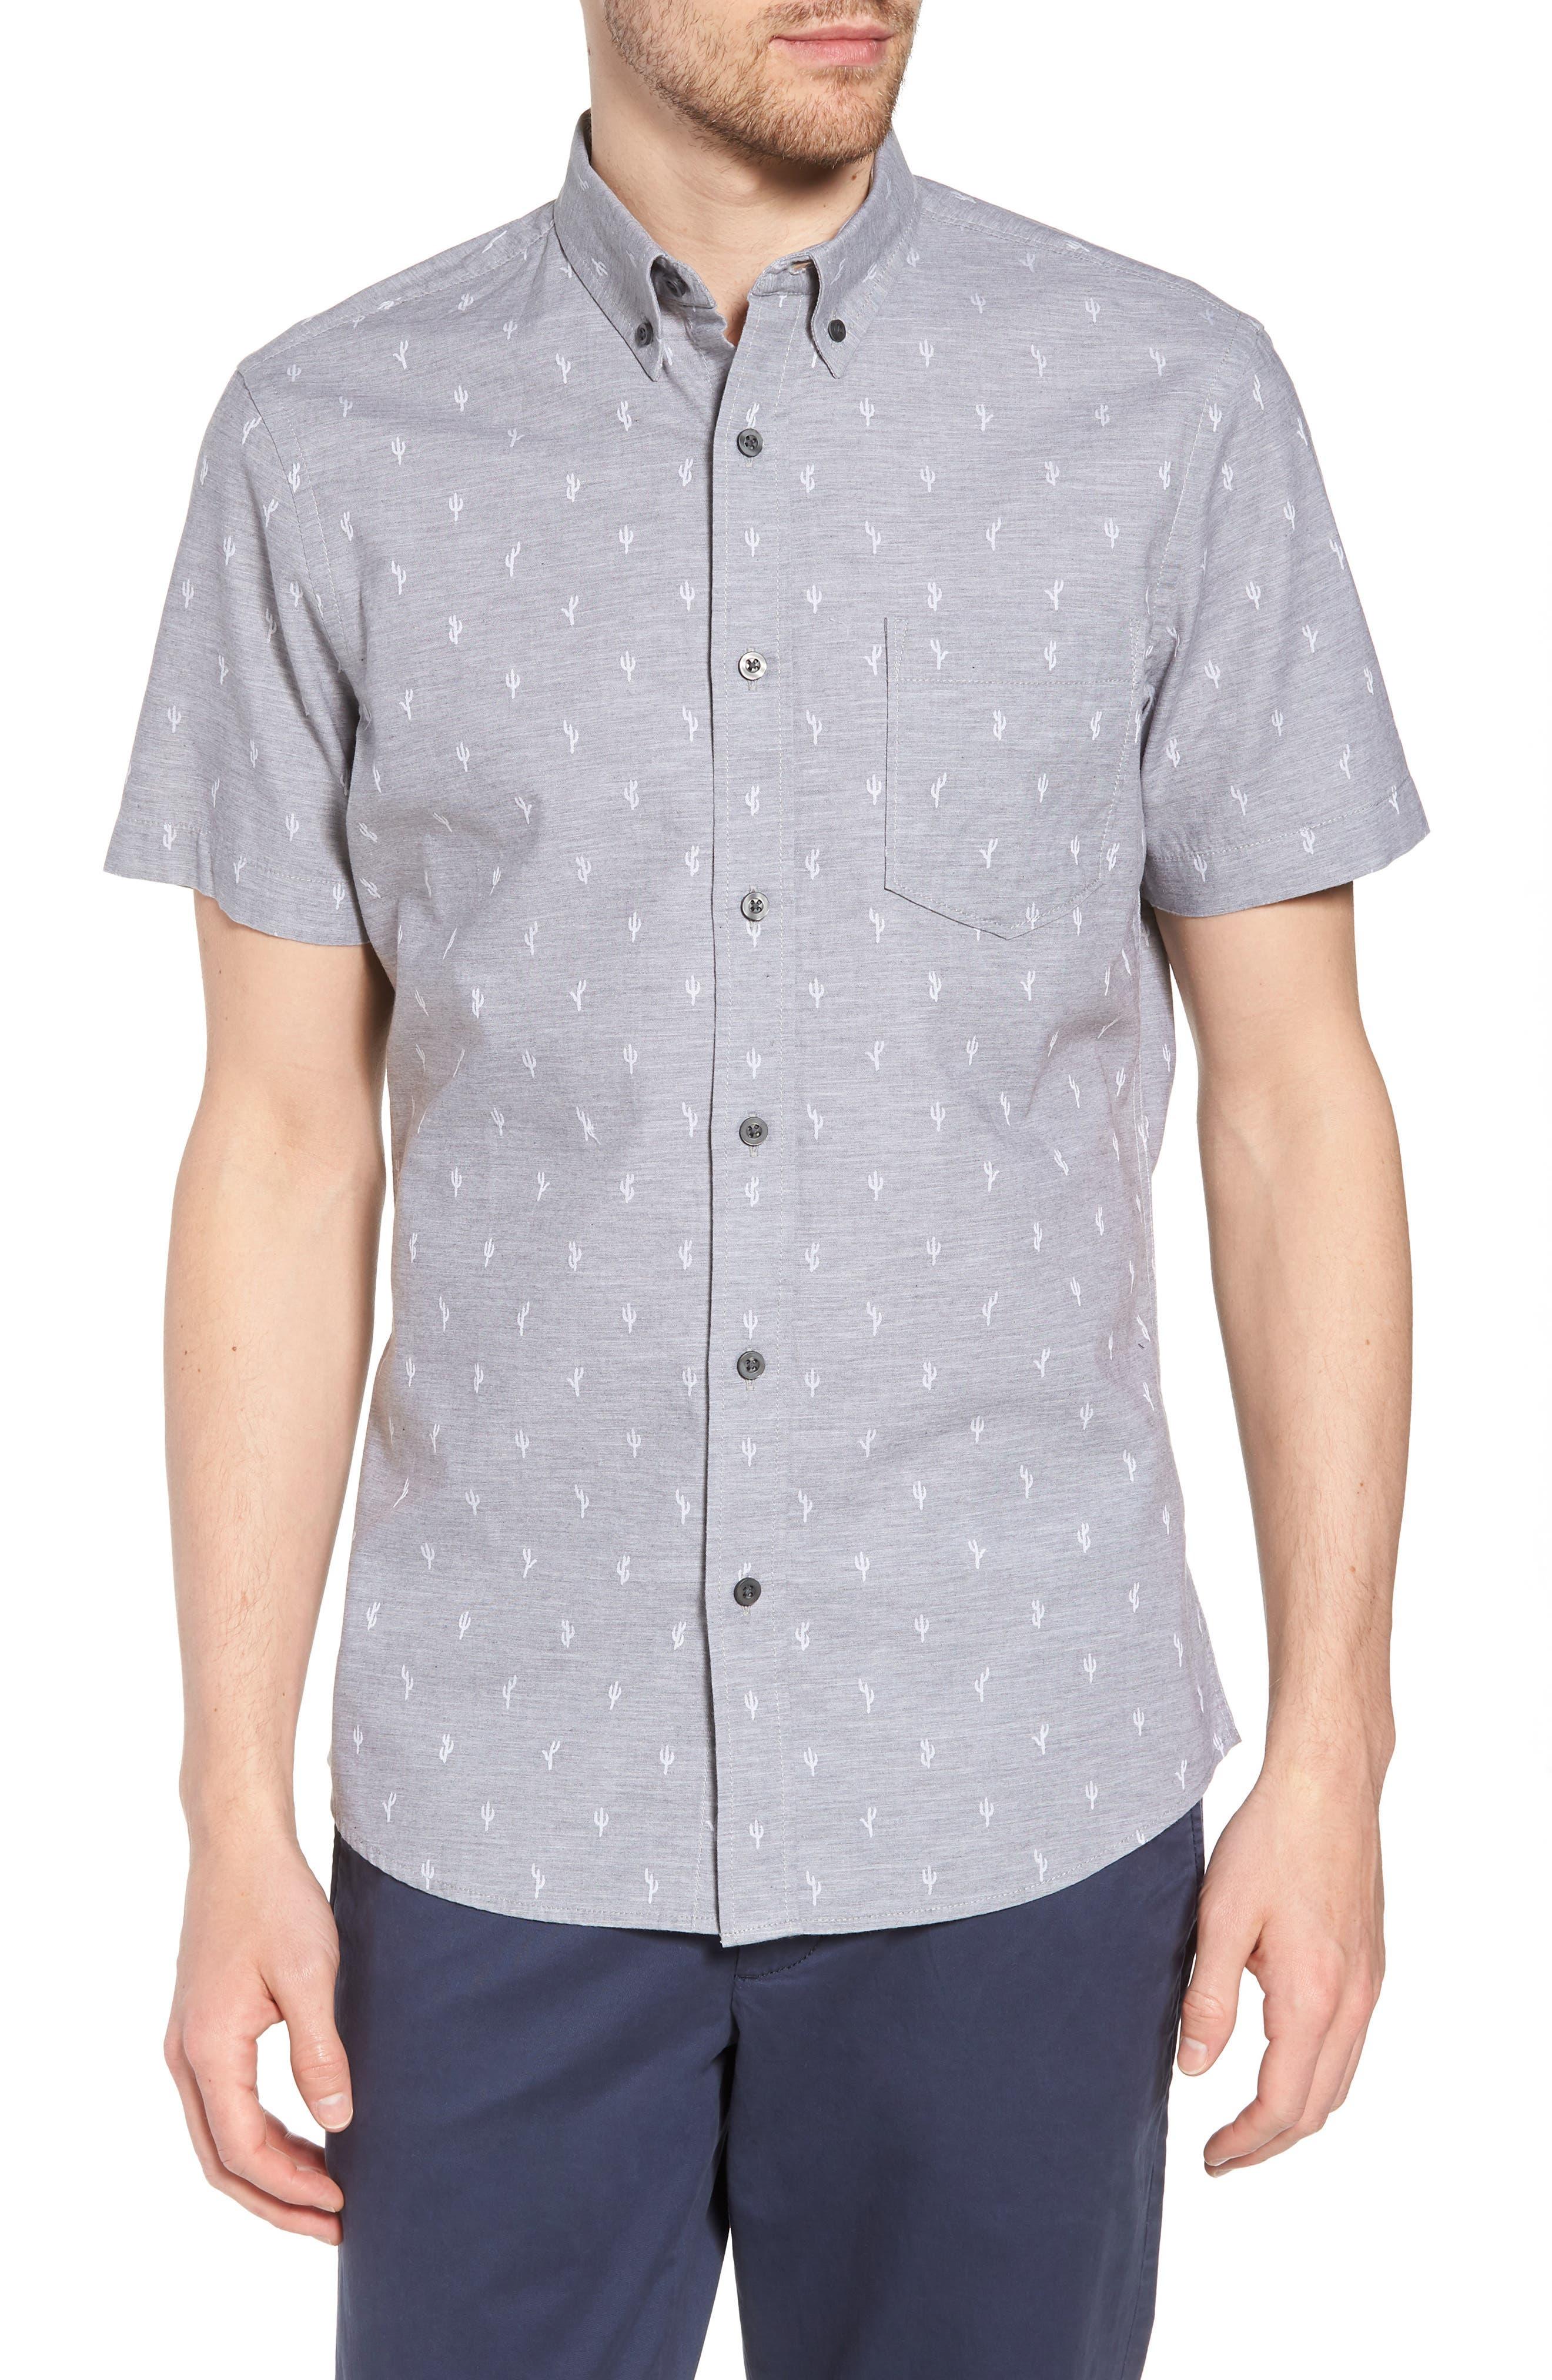 Cactus Print Dobby Sport Shirt,                             Main thumbnail 1, color,                             Grey Weather Cactus Dobby